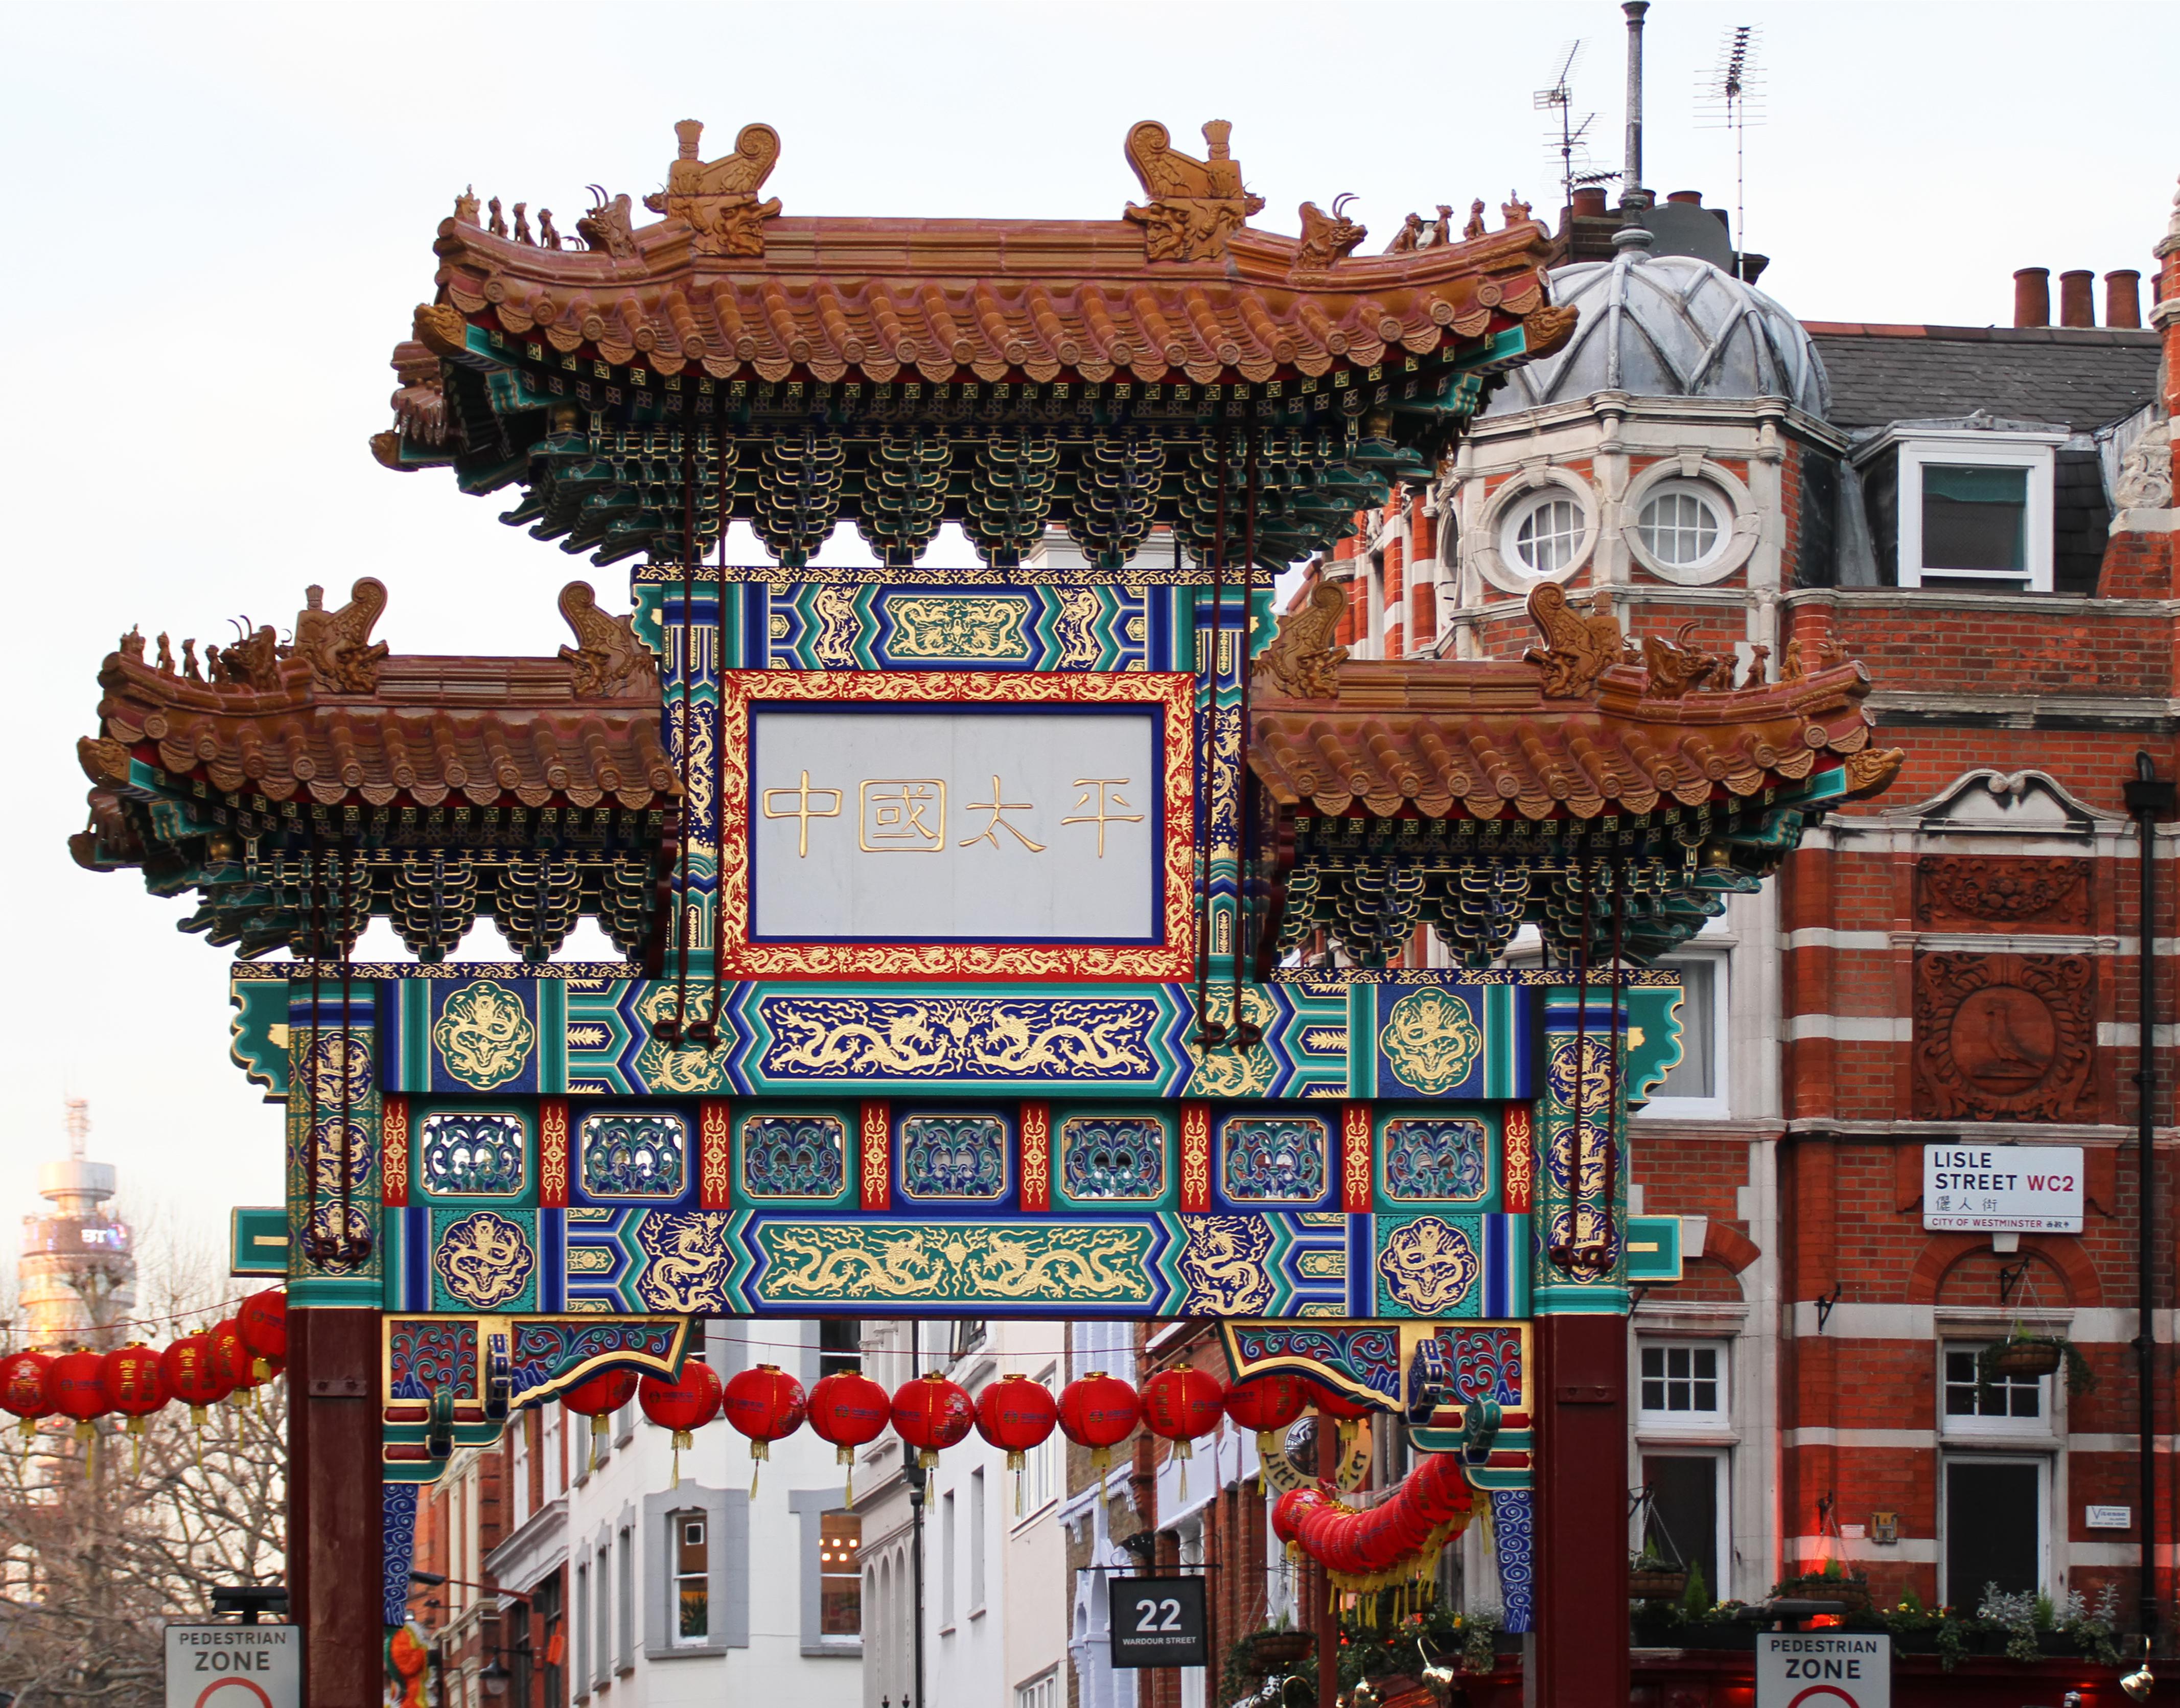 Sensational Chinatown London Wikipedia Download Free Architecture Designs Itiscsunscenecom